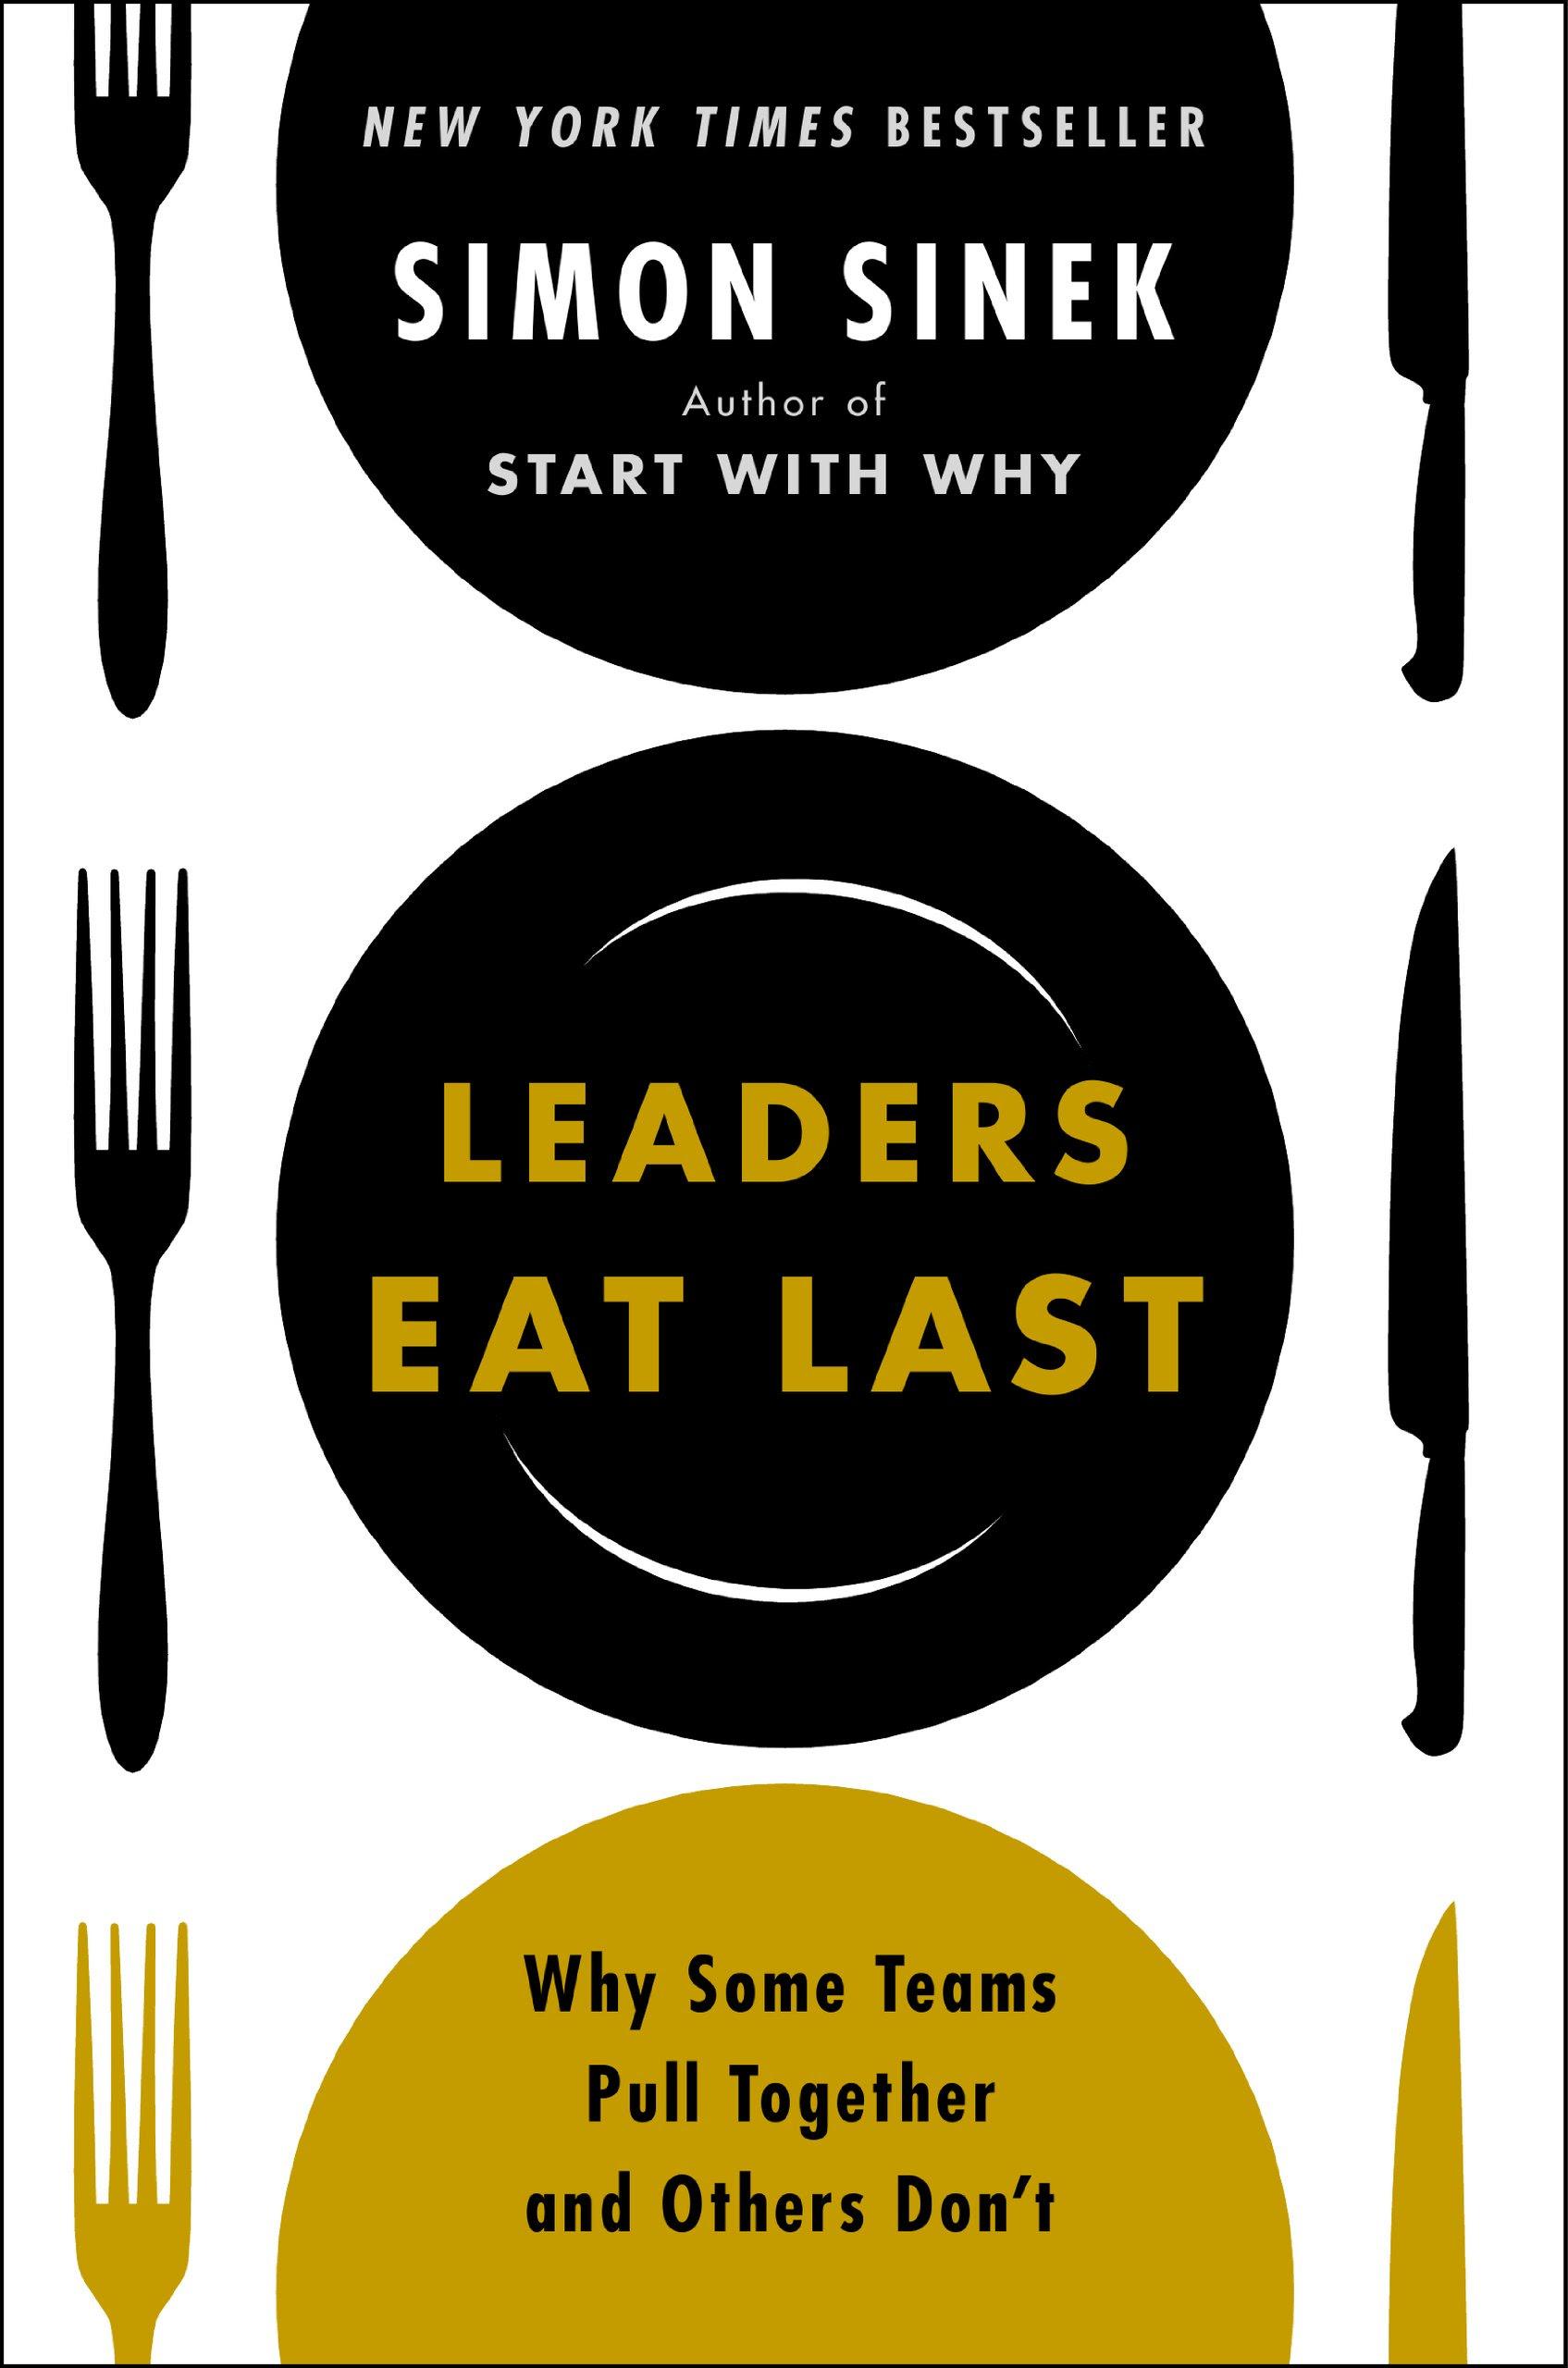 Leaders Eat Last By Simon Sinek In 10 Quotes Josh Daffern